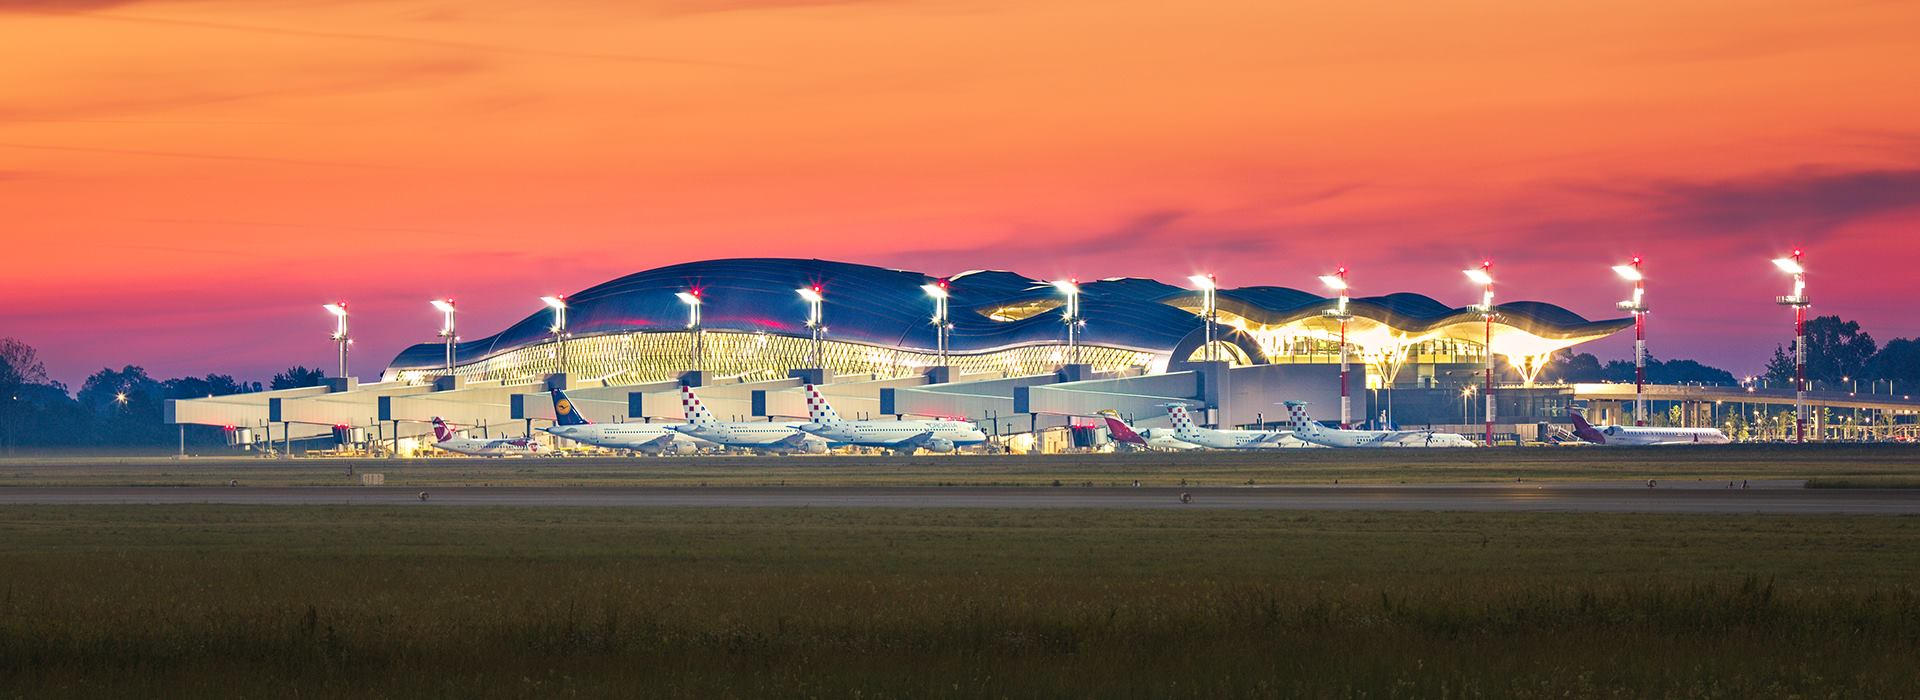 Zračna luka Franjo Tuđman rekordna po broju putnika u ljetnom redu letenja 2017. godine